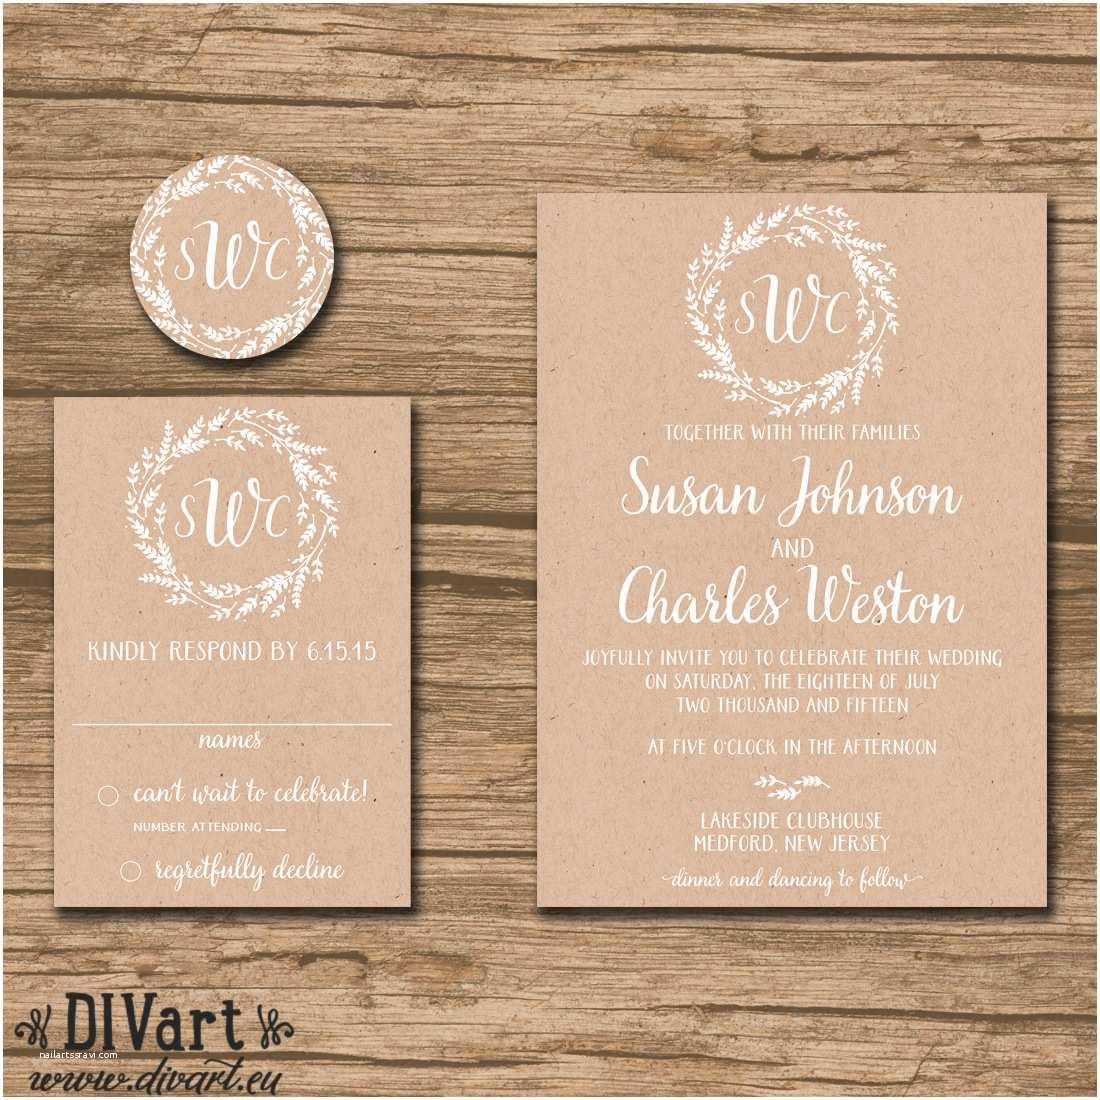 Wedding Invitation Card Paper Rustic Wedding Invitation Suite Response Card Monogram